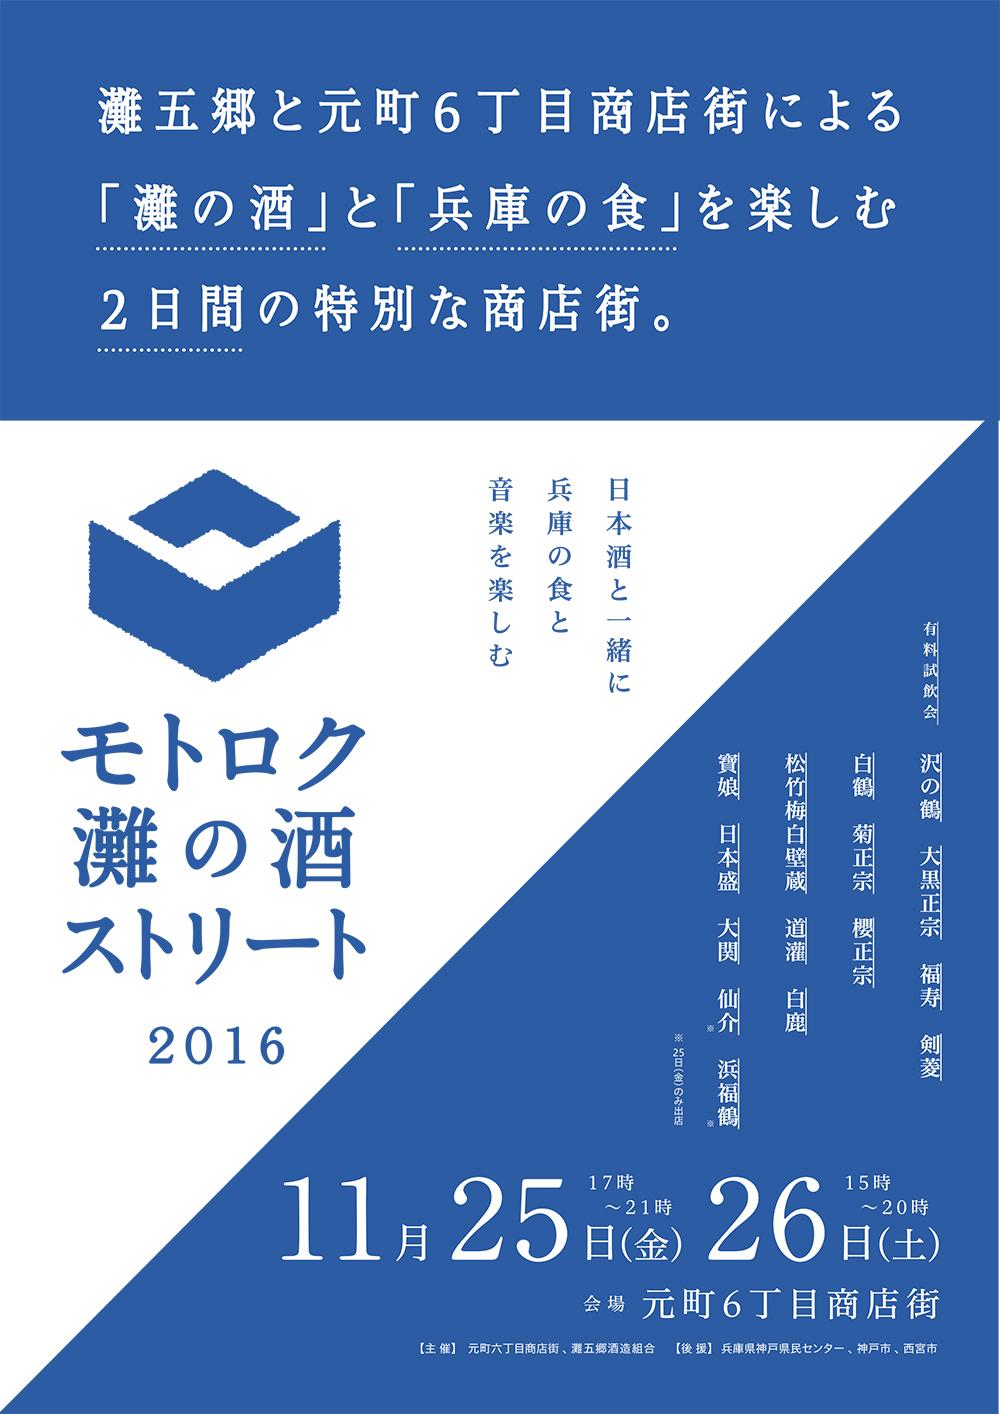 http://www.hakushika.co.jp/topics/images/motoroku2016_1.jpg